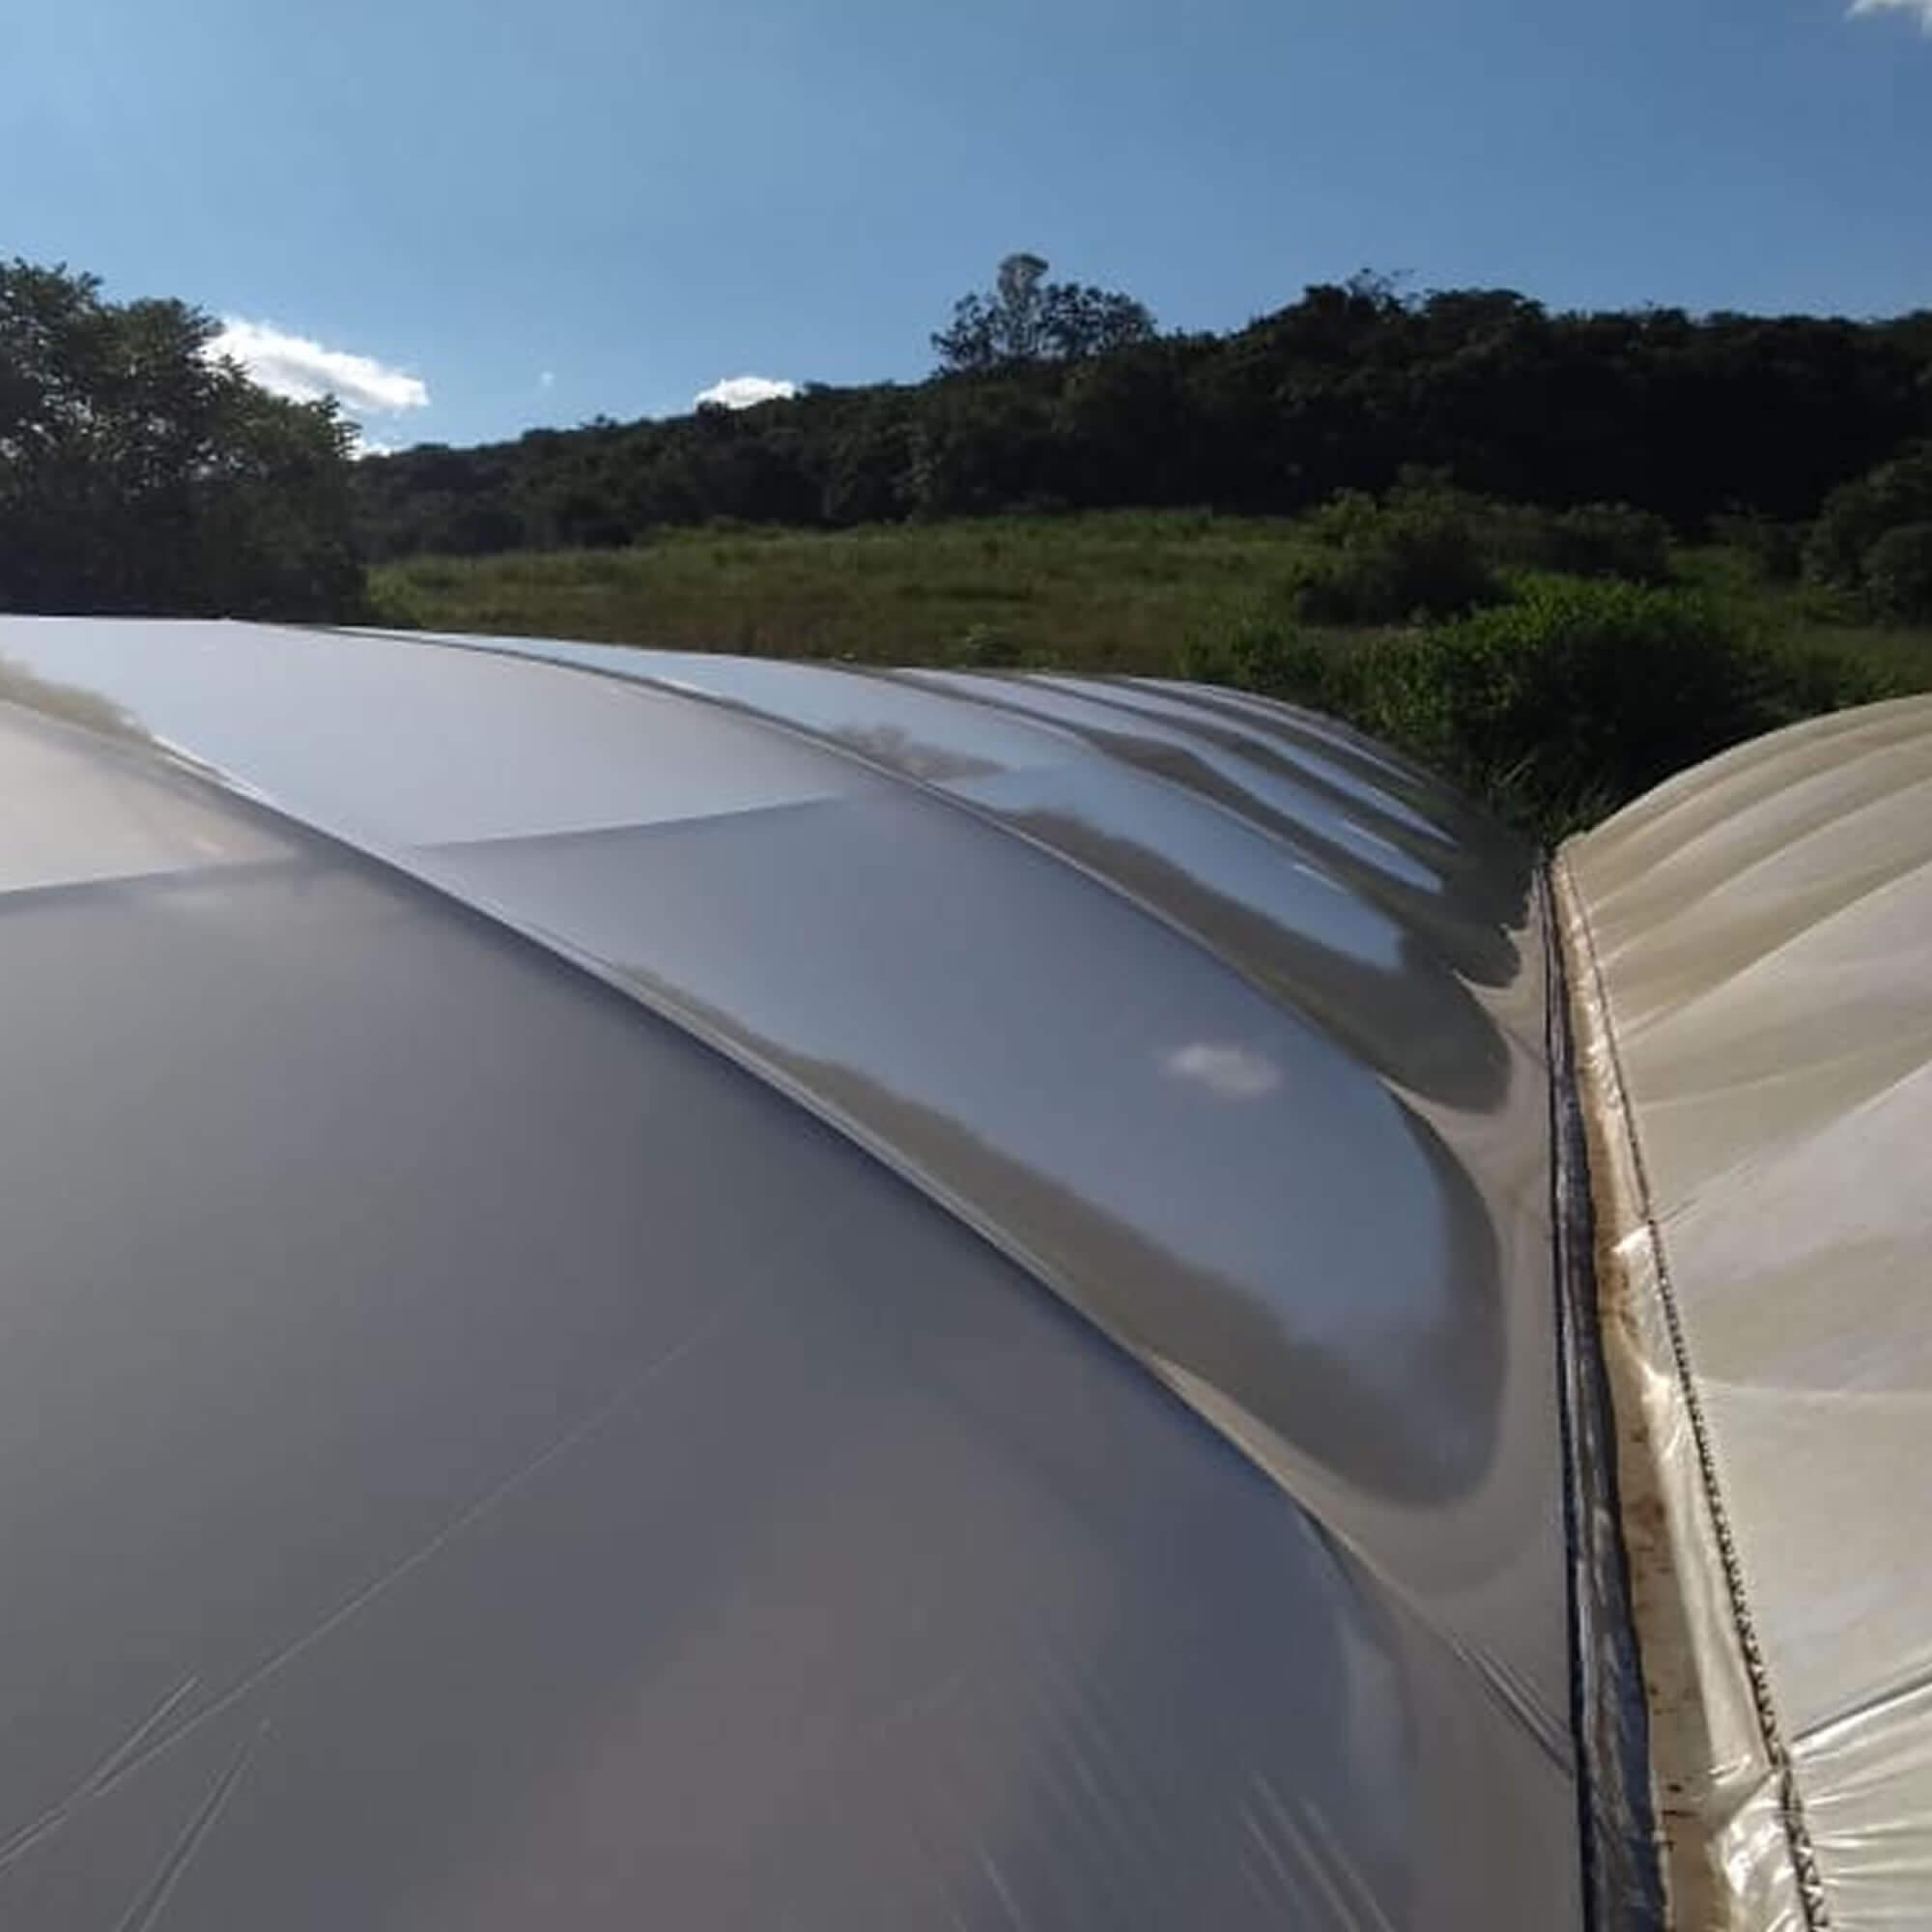 Filme Plástico Difusor para Estufa - 12x55 metros - 120 micras - Politiv